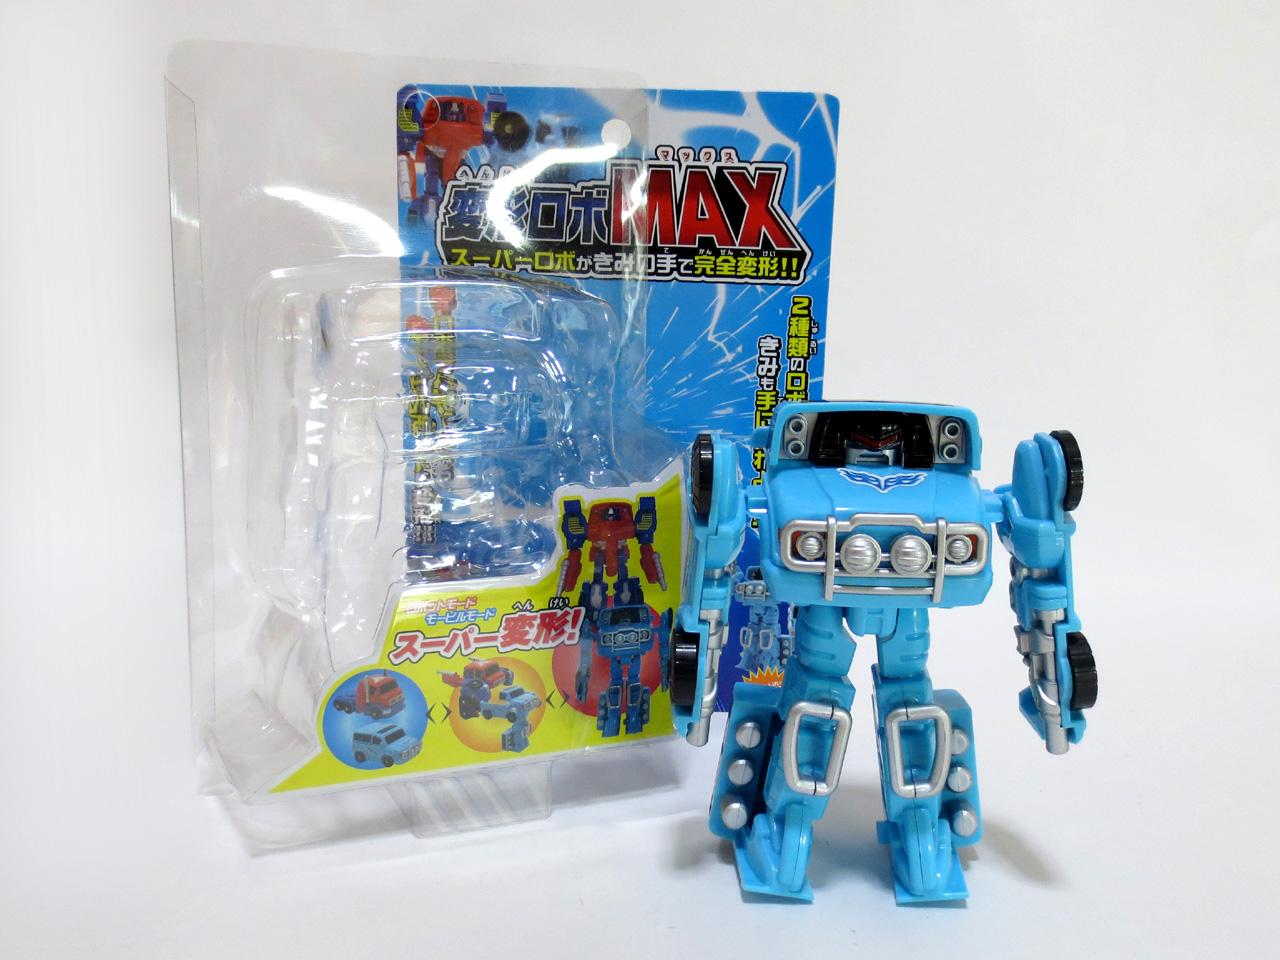 Robo_max_4wd_type_05.jpg